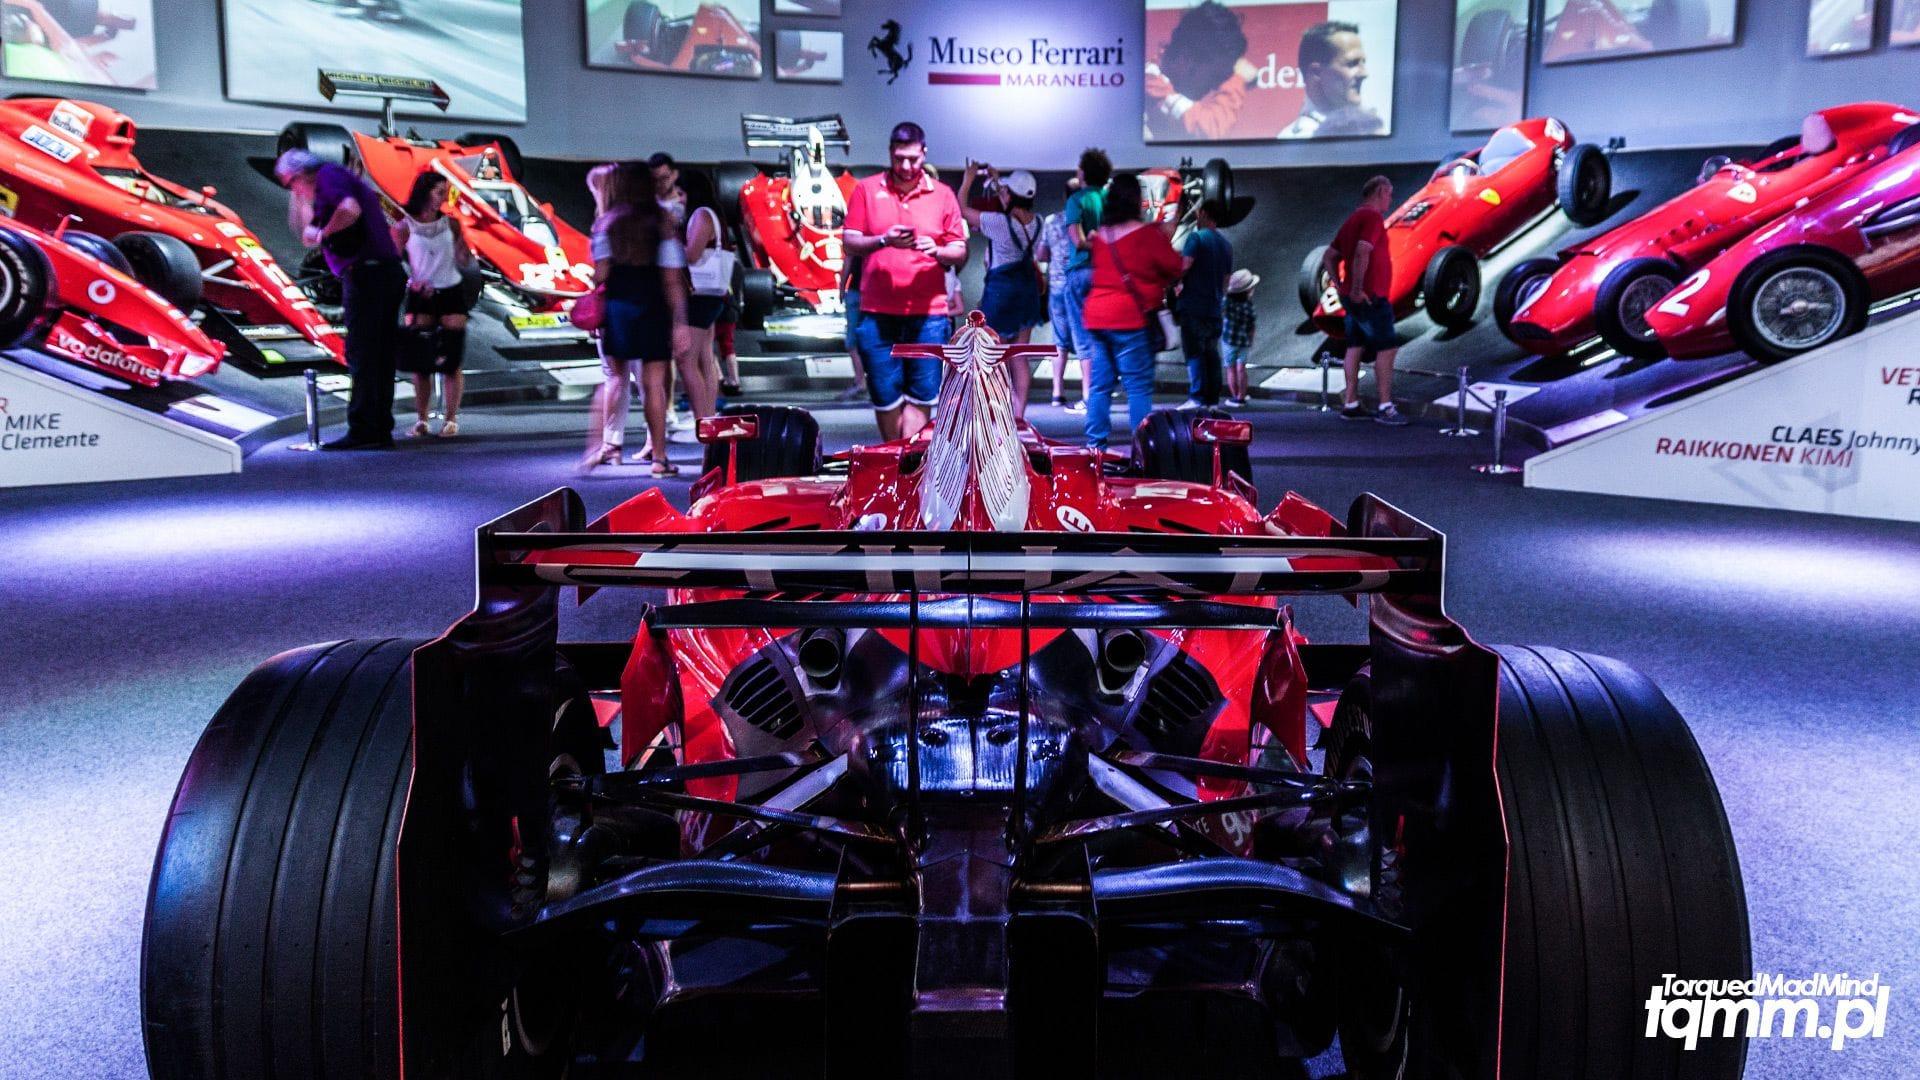 Fotki #95: Museo Ferrari Maranello